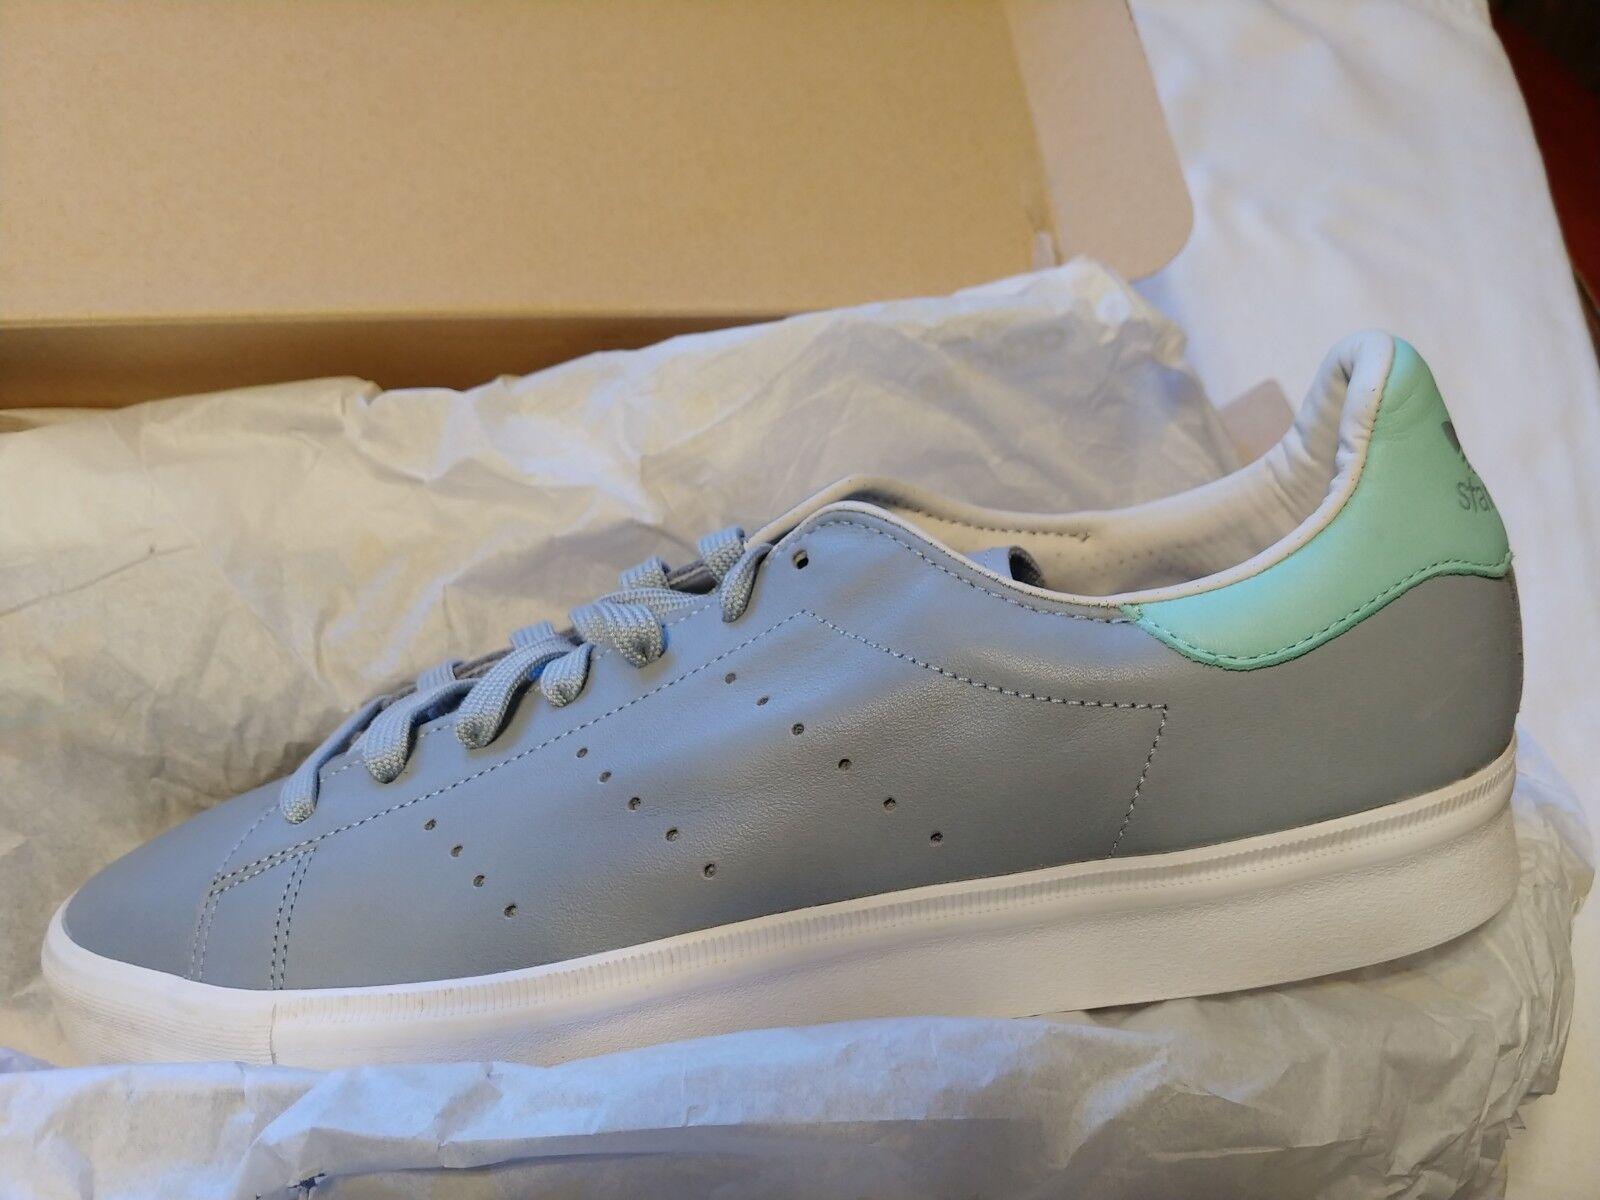 Adidas Stan Smith Vulc Size 10.5 NIB